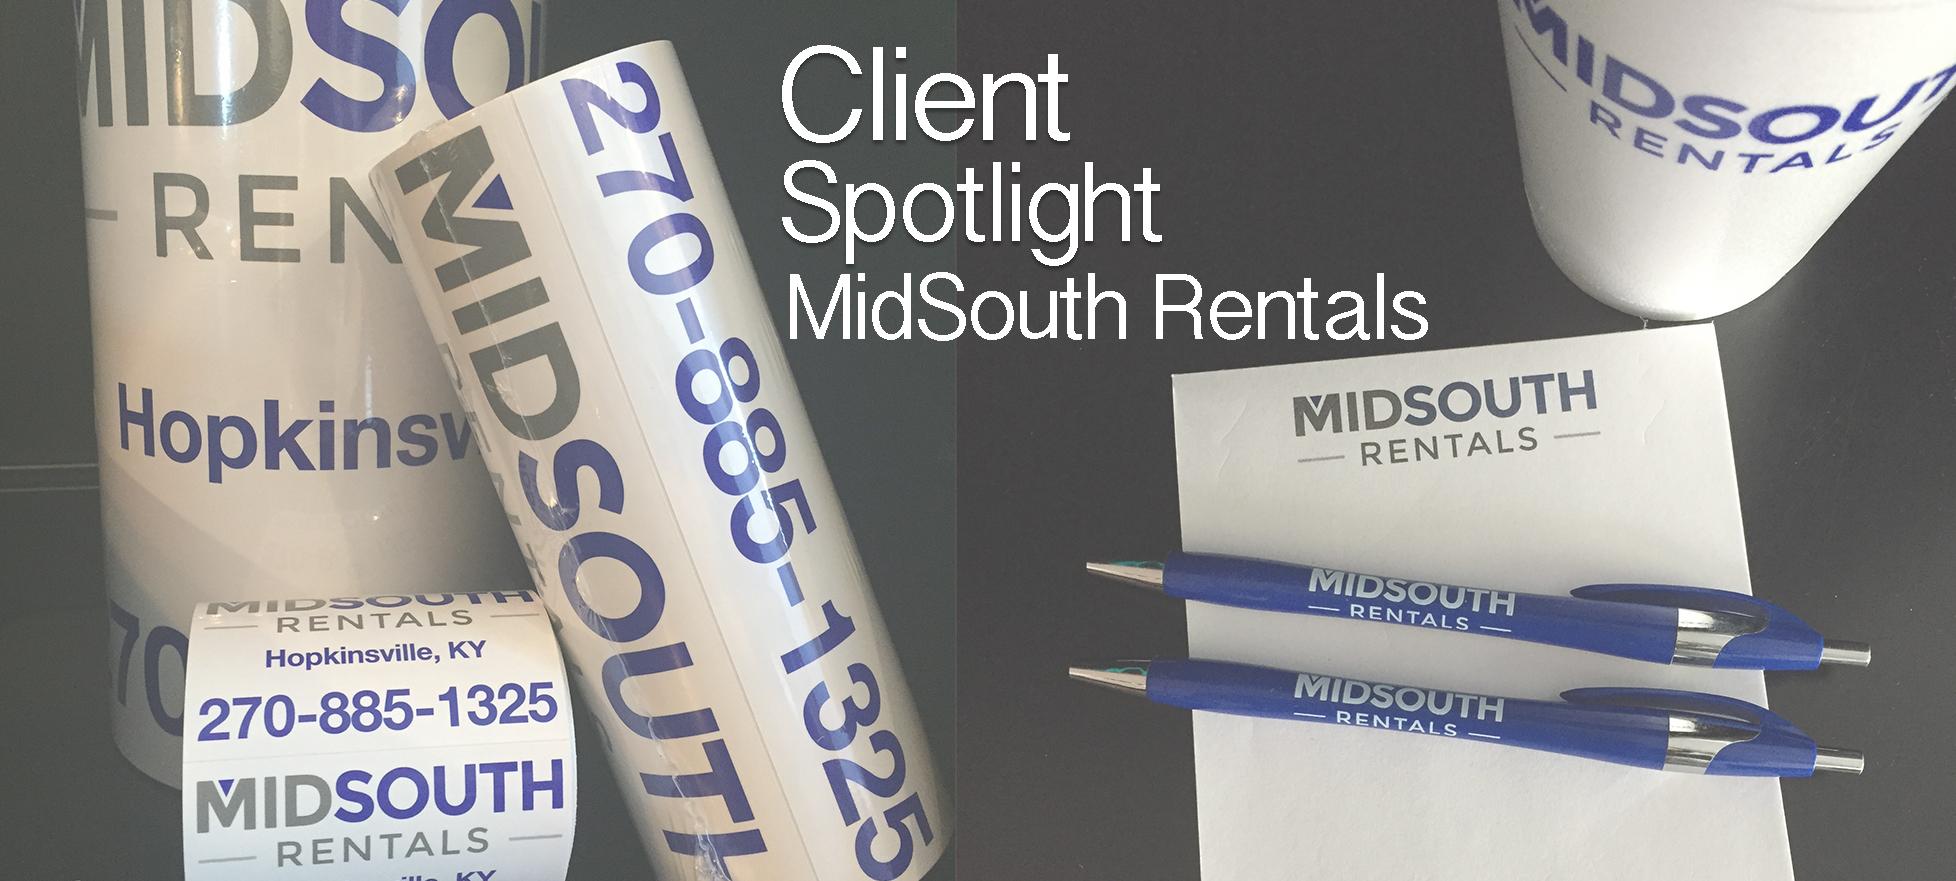 MidSouth Rentals Hopkinsville